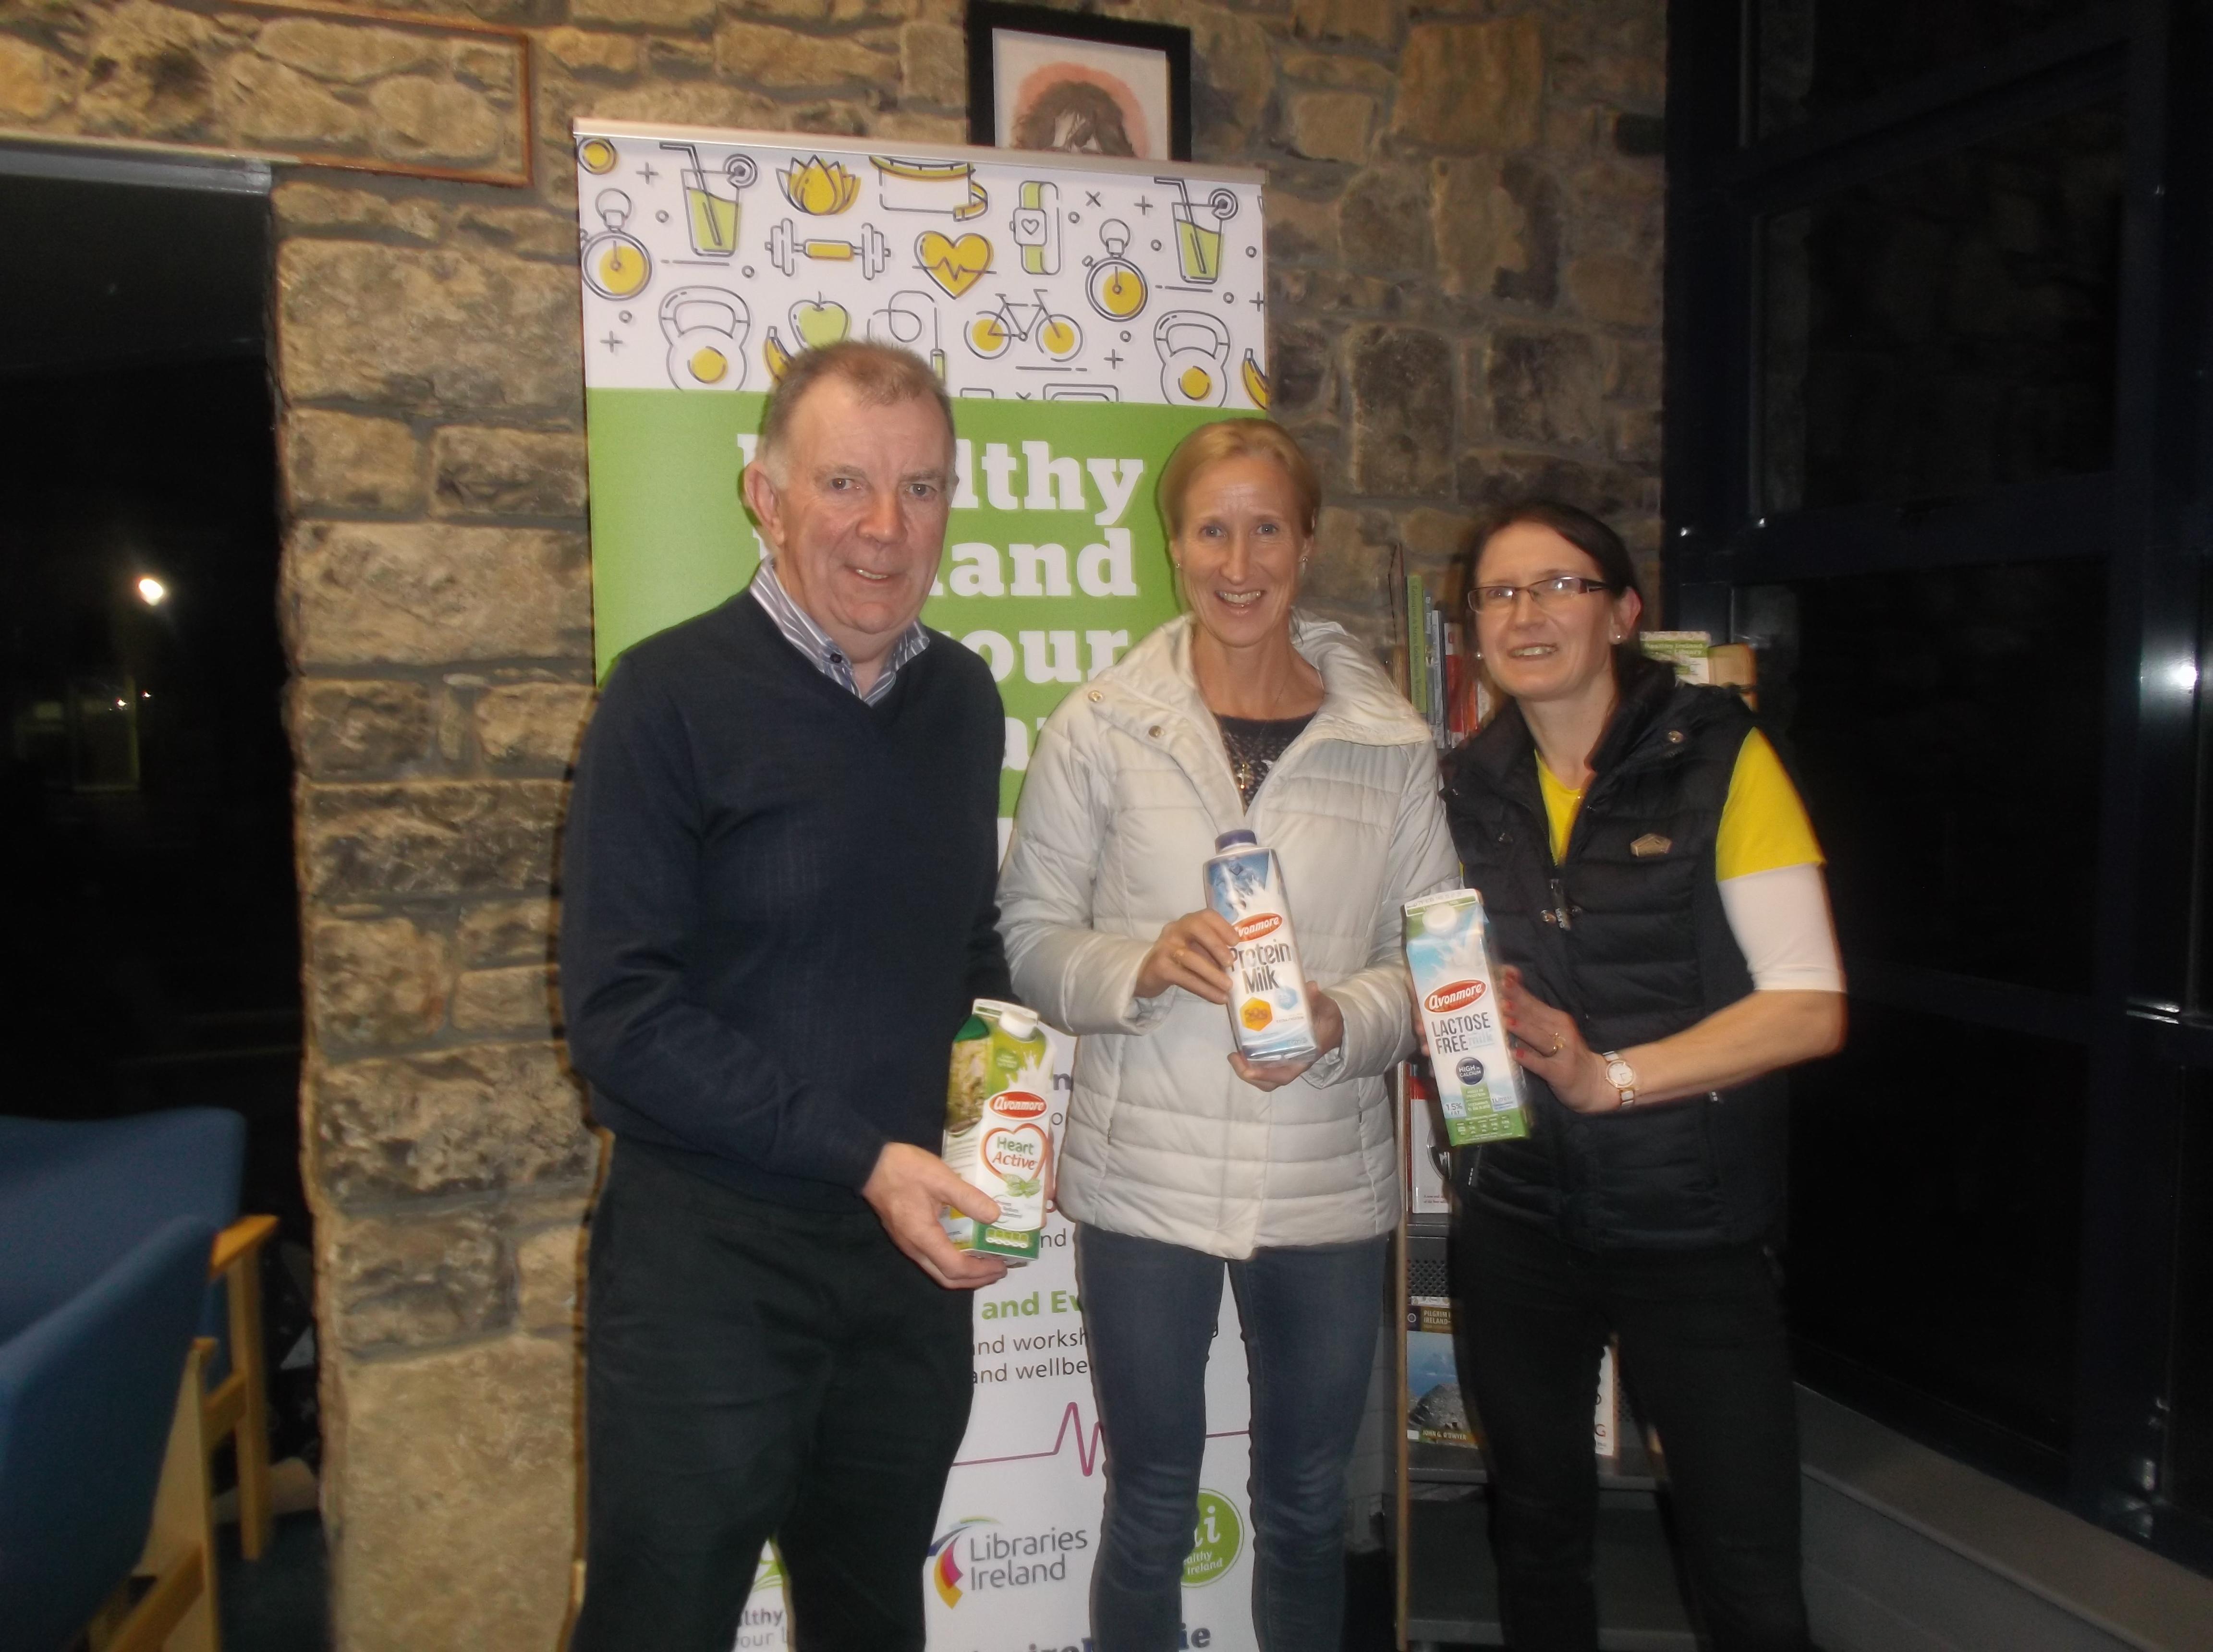 Cashel: Healthy Ireland with Catherina McKiernan